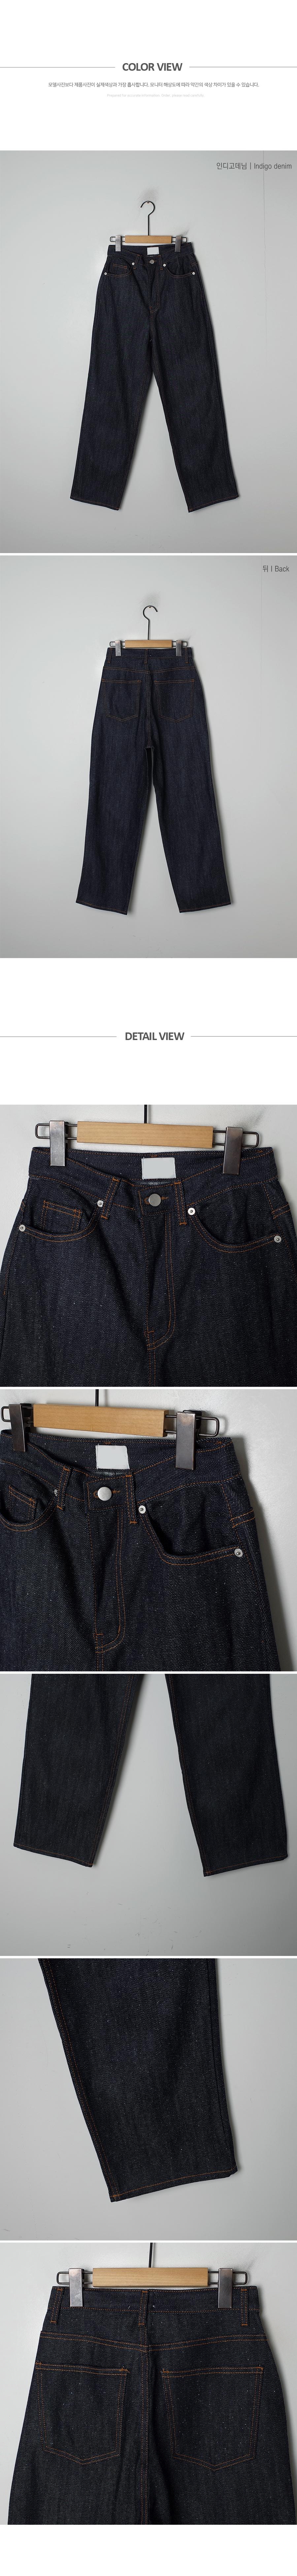 Fashion People's Choice Wide Denim Pants